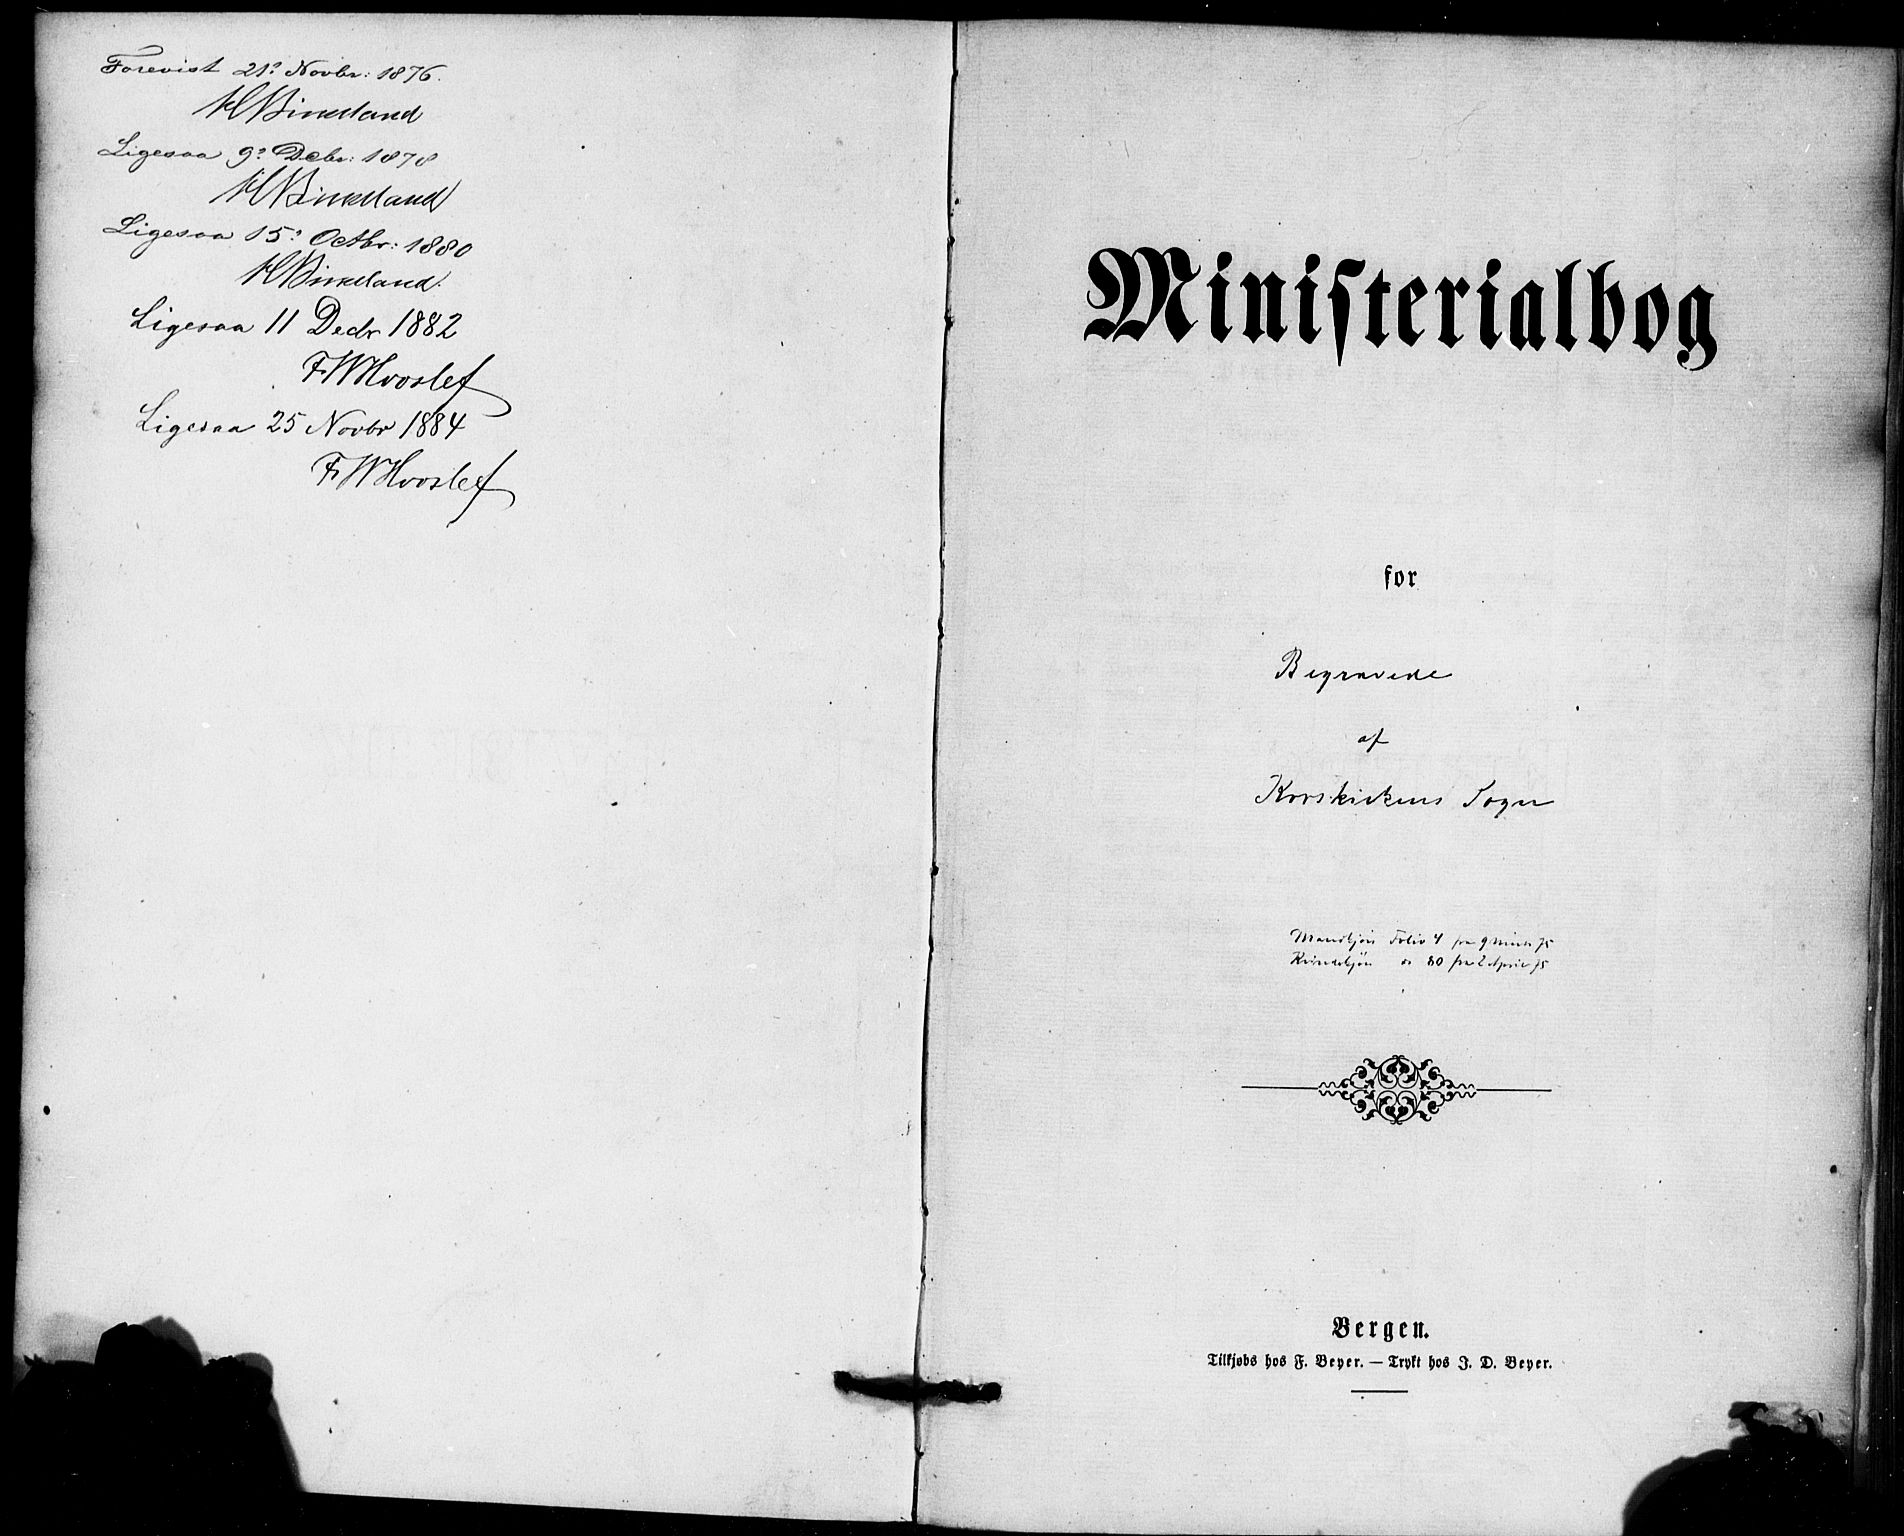 SAB, Korskirken Sokneprestembete, H/Haa/L0046: Ministerialbok nr. E 4, 1875-1883